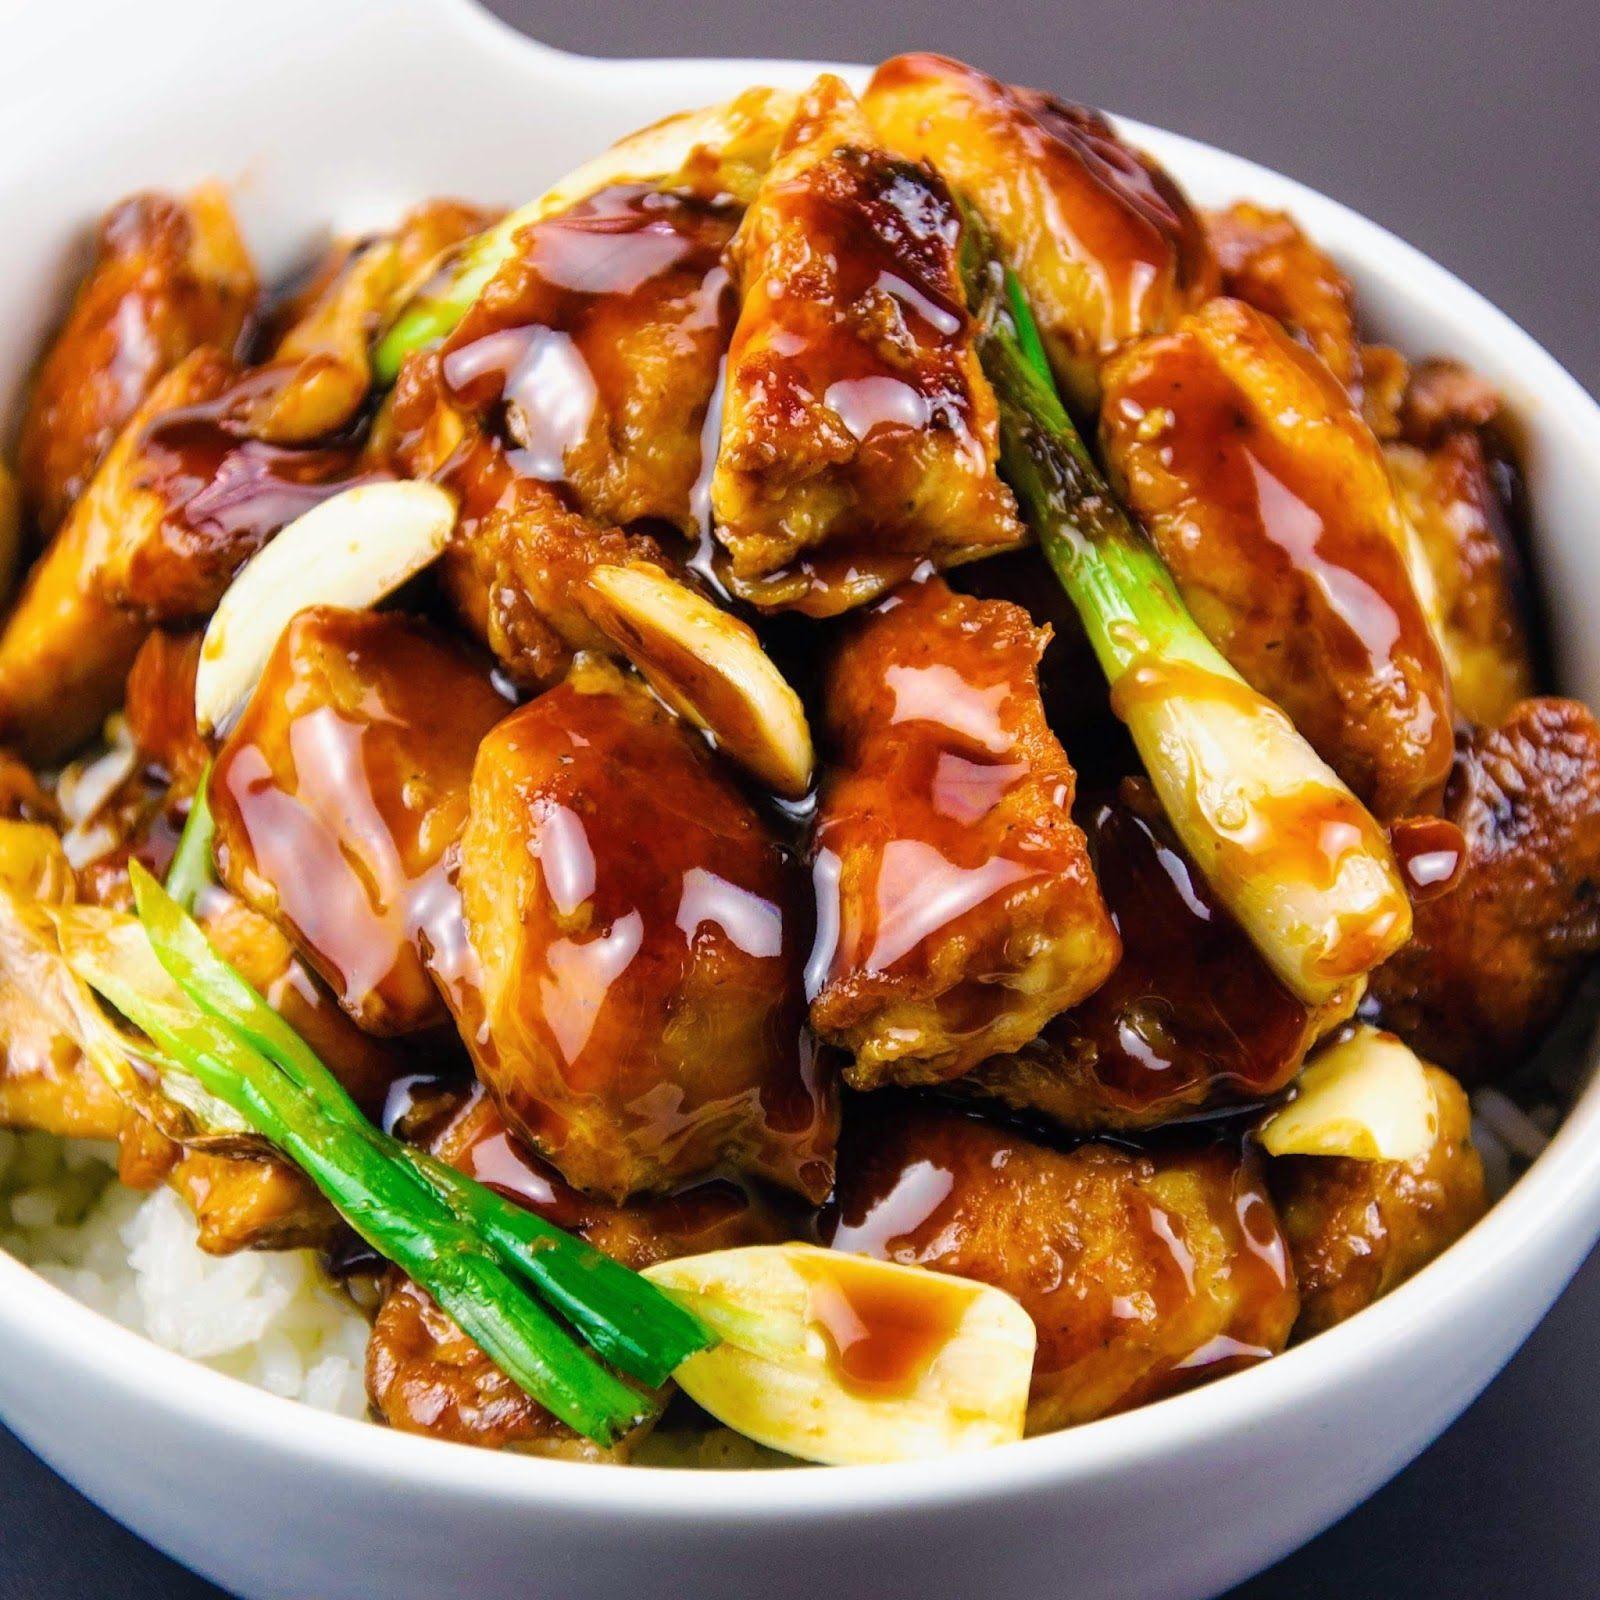 Diabetic Foods Recipes  Diabetic Recipes for Dinner Diabetic Dinner Recipes